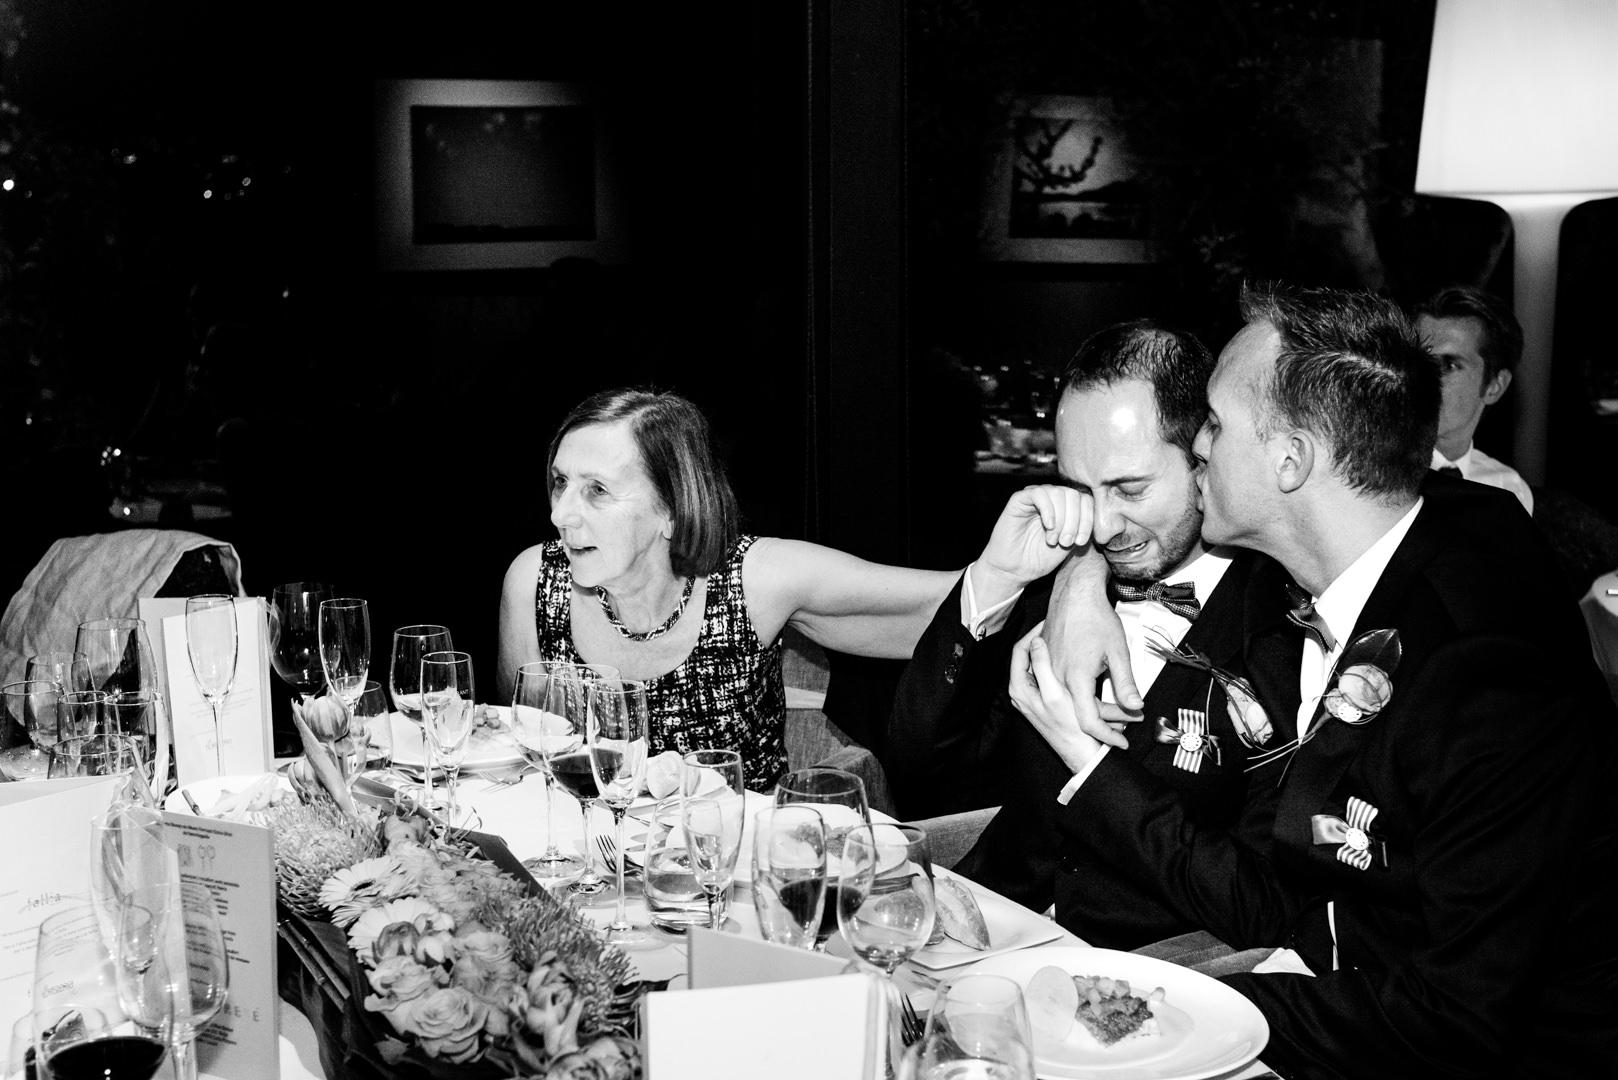 Same-sex-wedding-barcelona-boda- gay-samesex-engagement-Rafael-Torres-fotografo-bodas-sevilla-madrid-barcelona-wedding-photographer--51.jpg